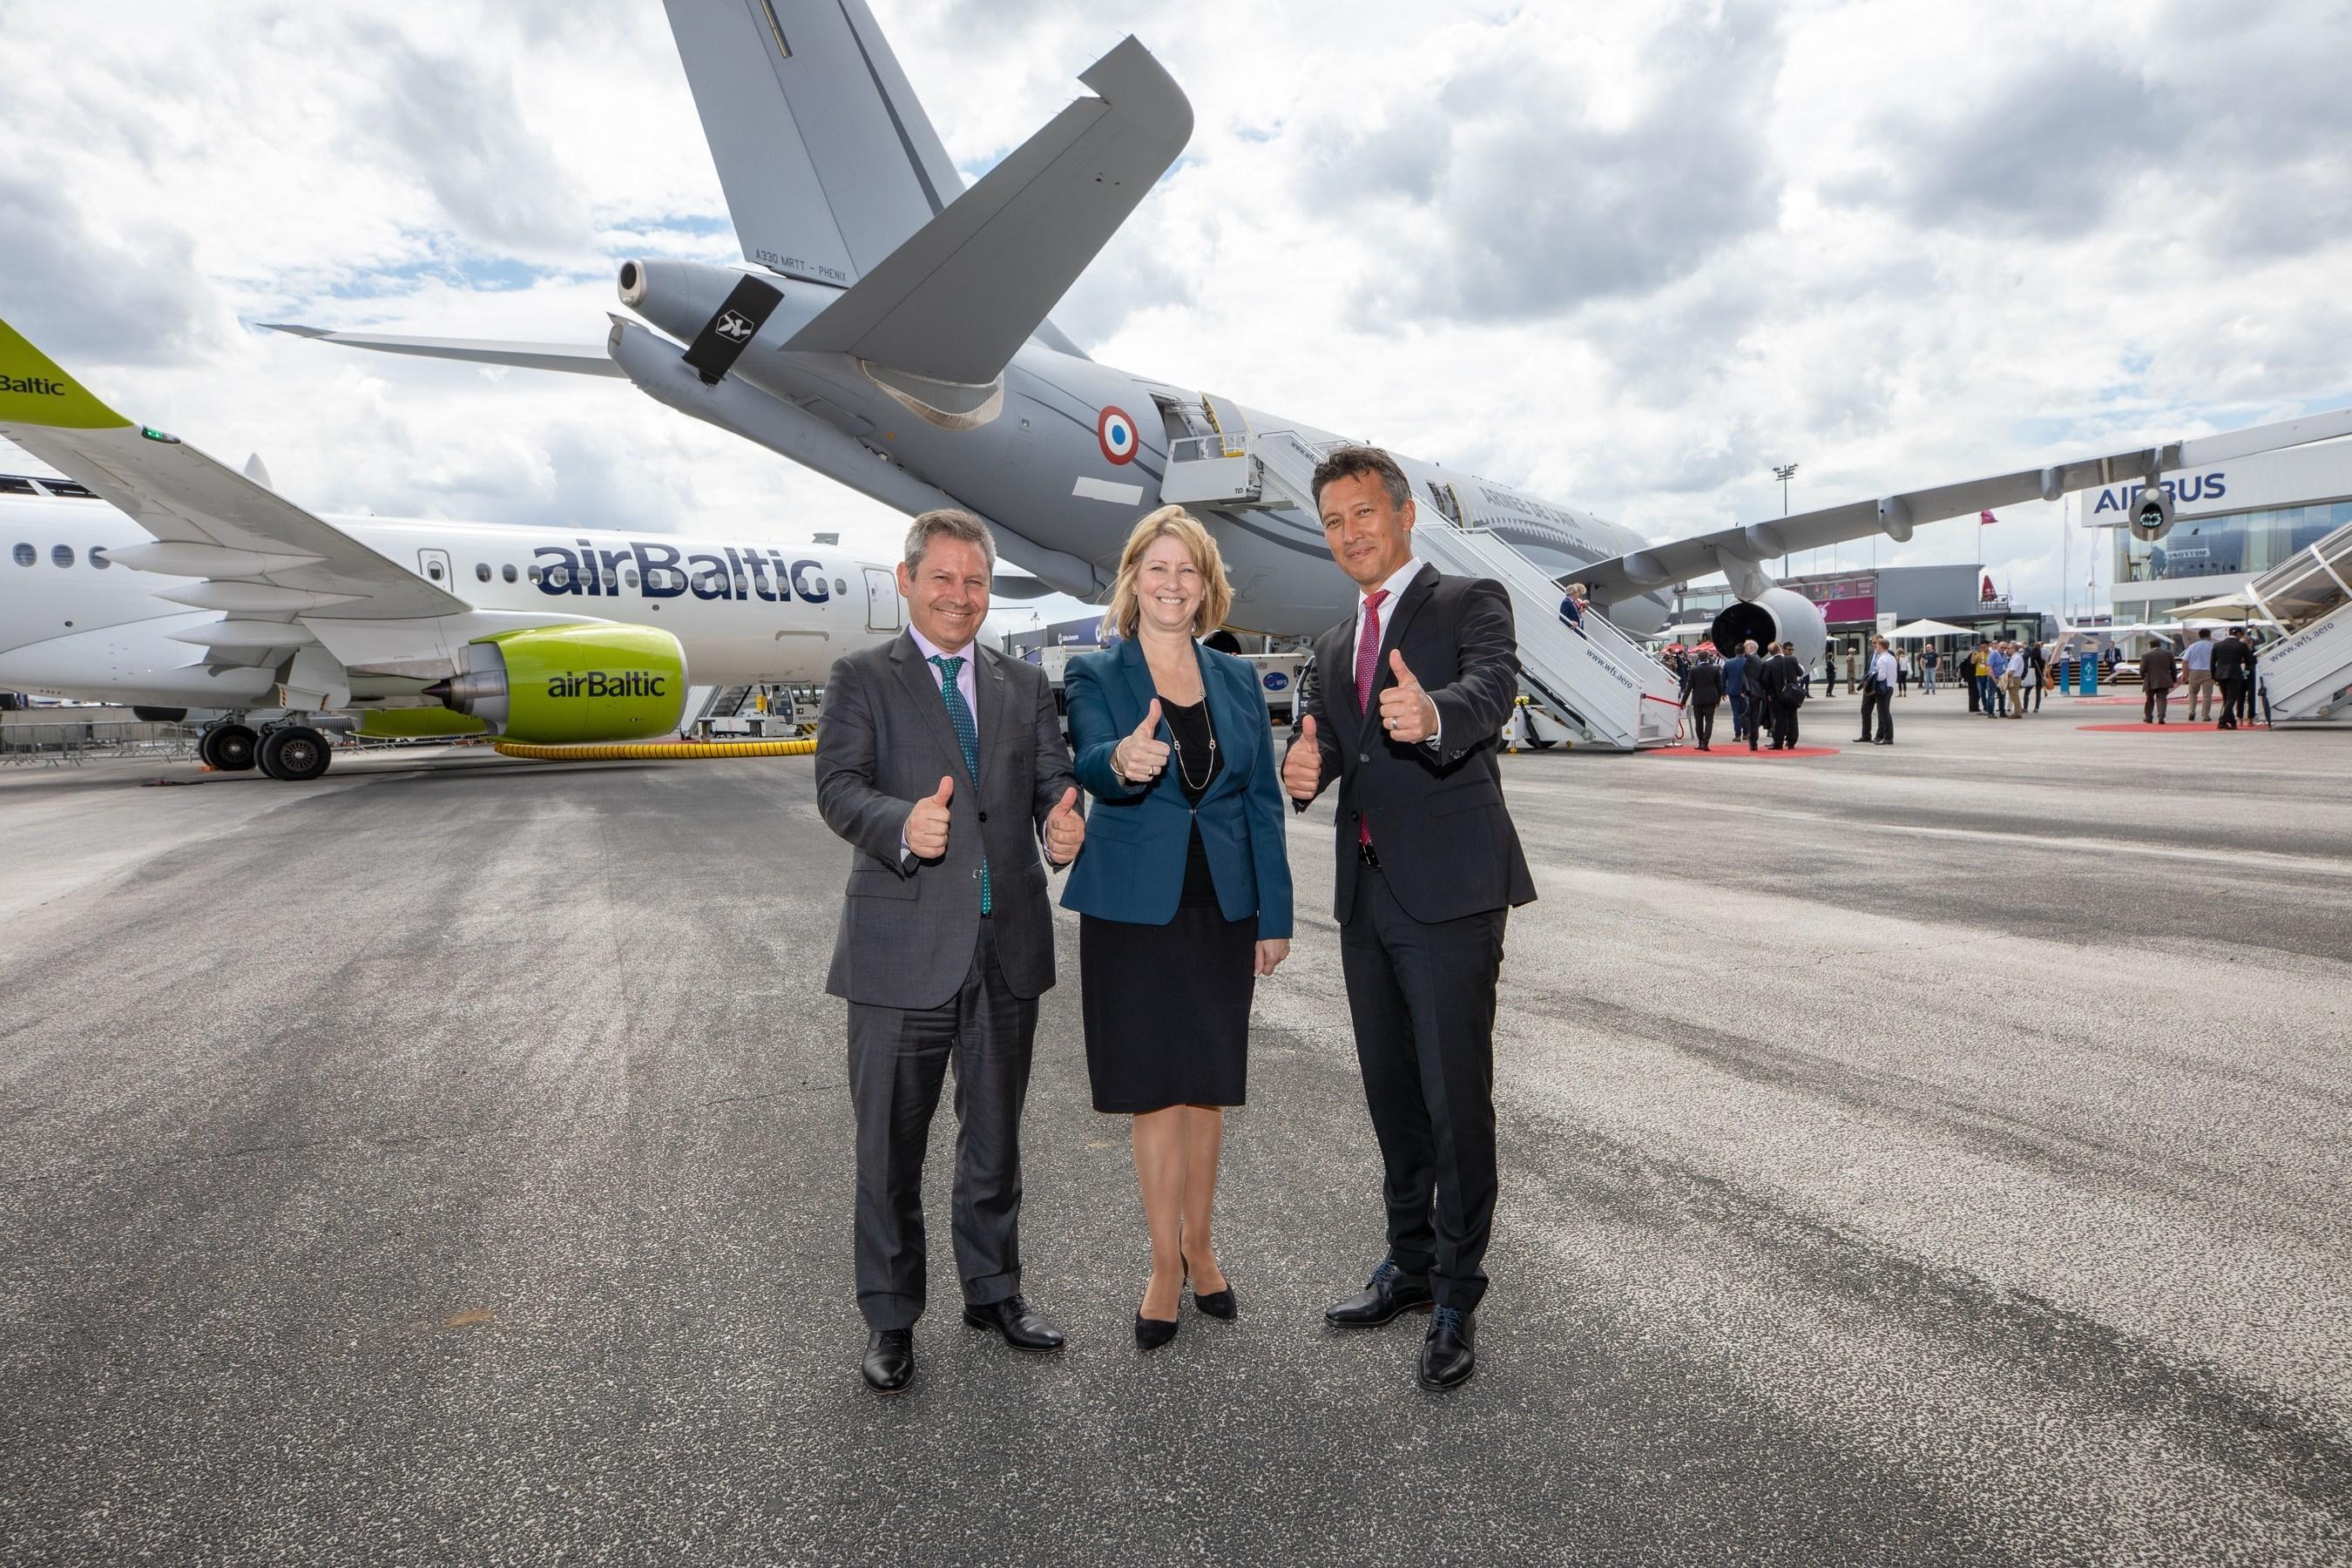 Lockheed Martin and Airbus reaffirm tanker partnership at